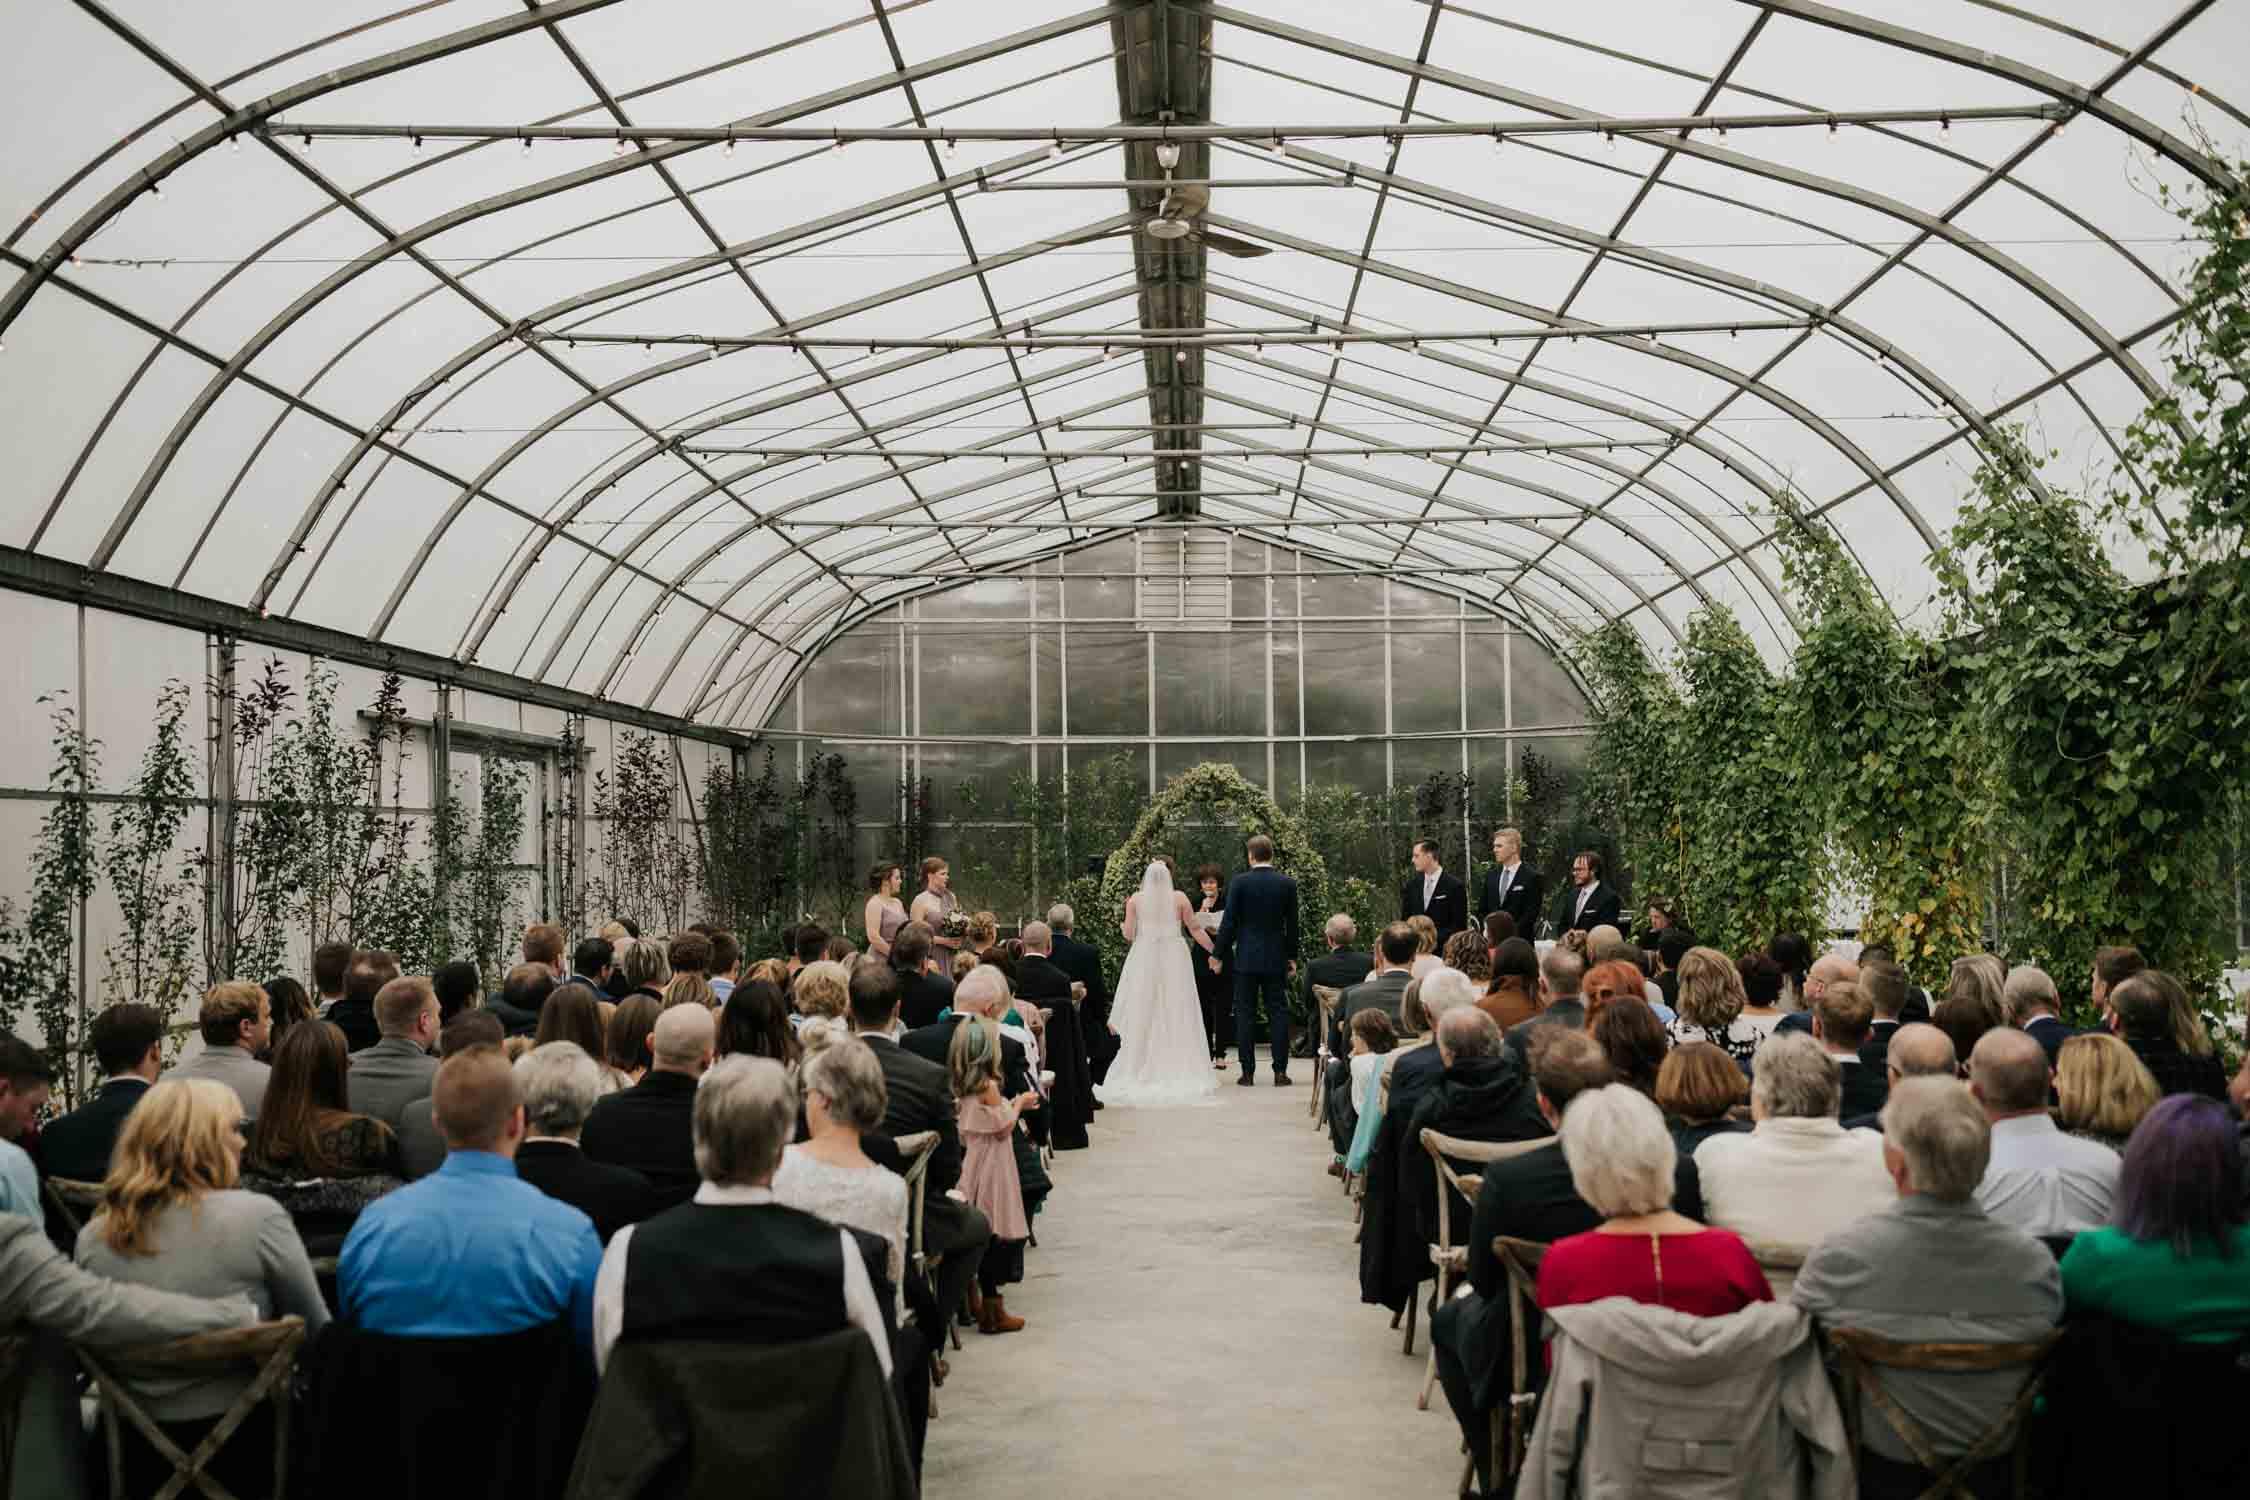 Wedding ceremony in the greenhouse at Saskatoon Farm Wedding Venue in Calgary, Alberta.